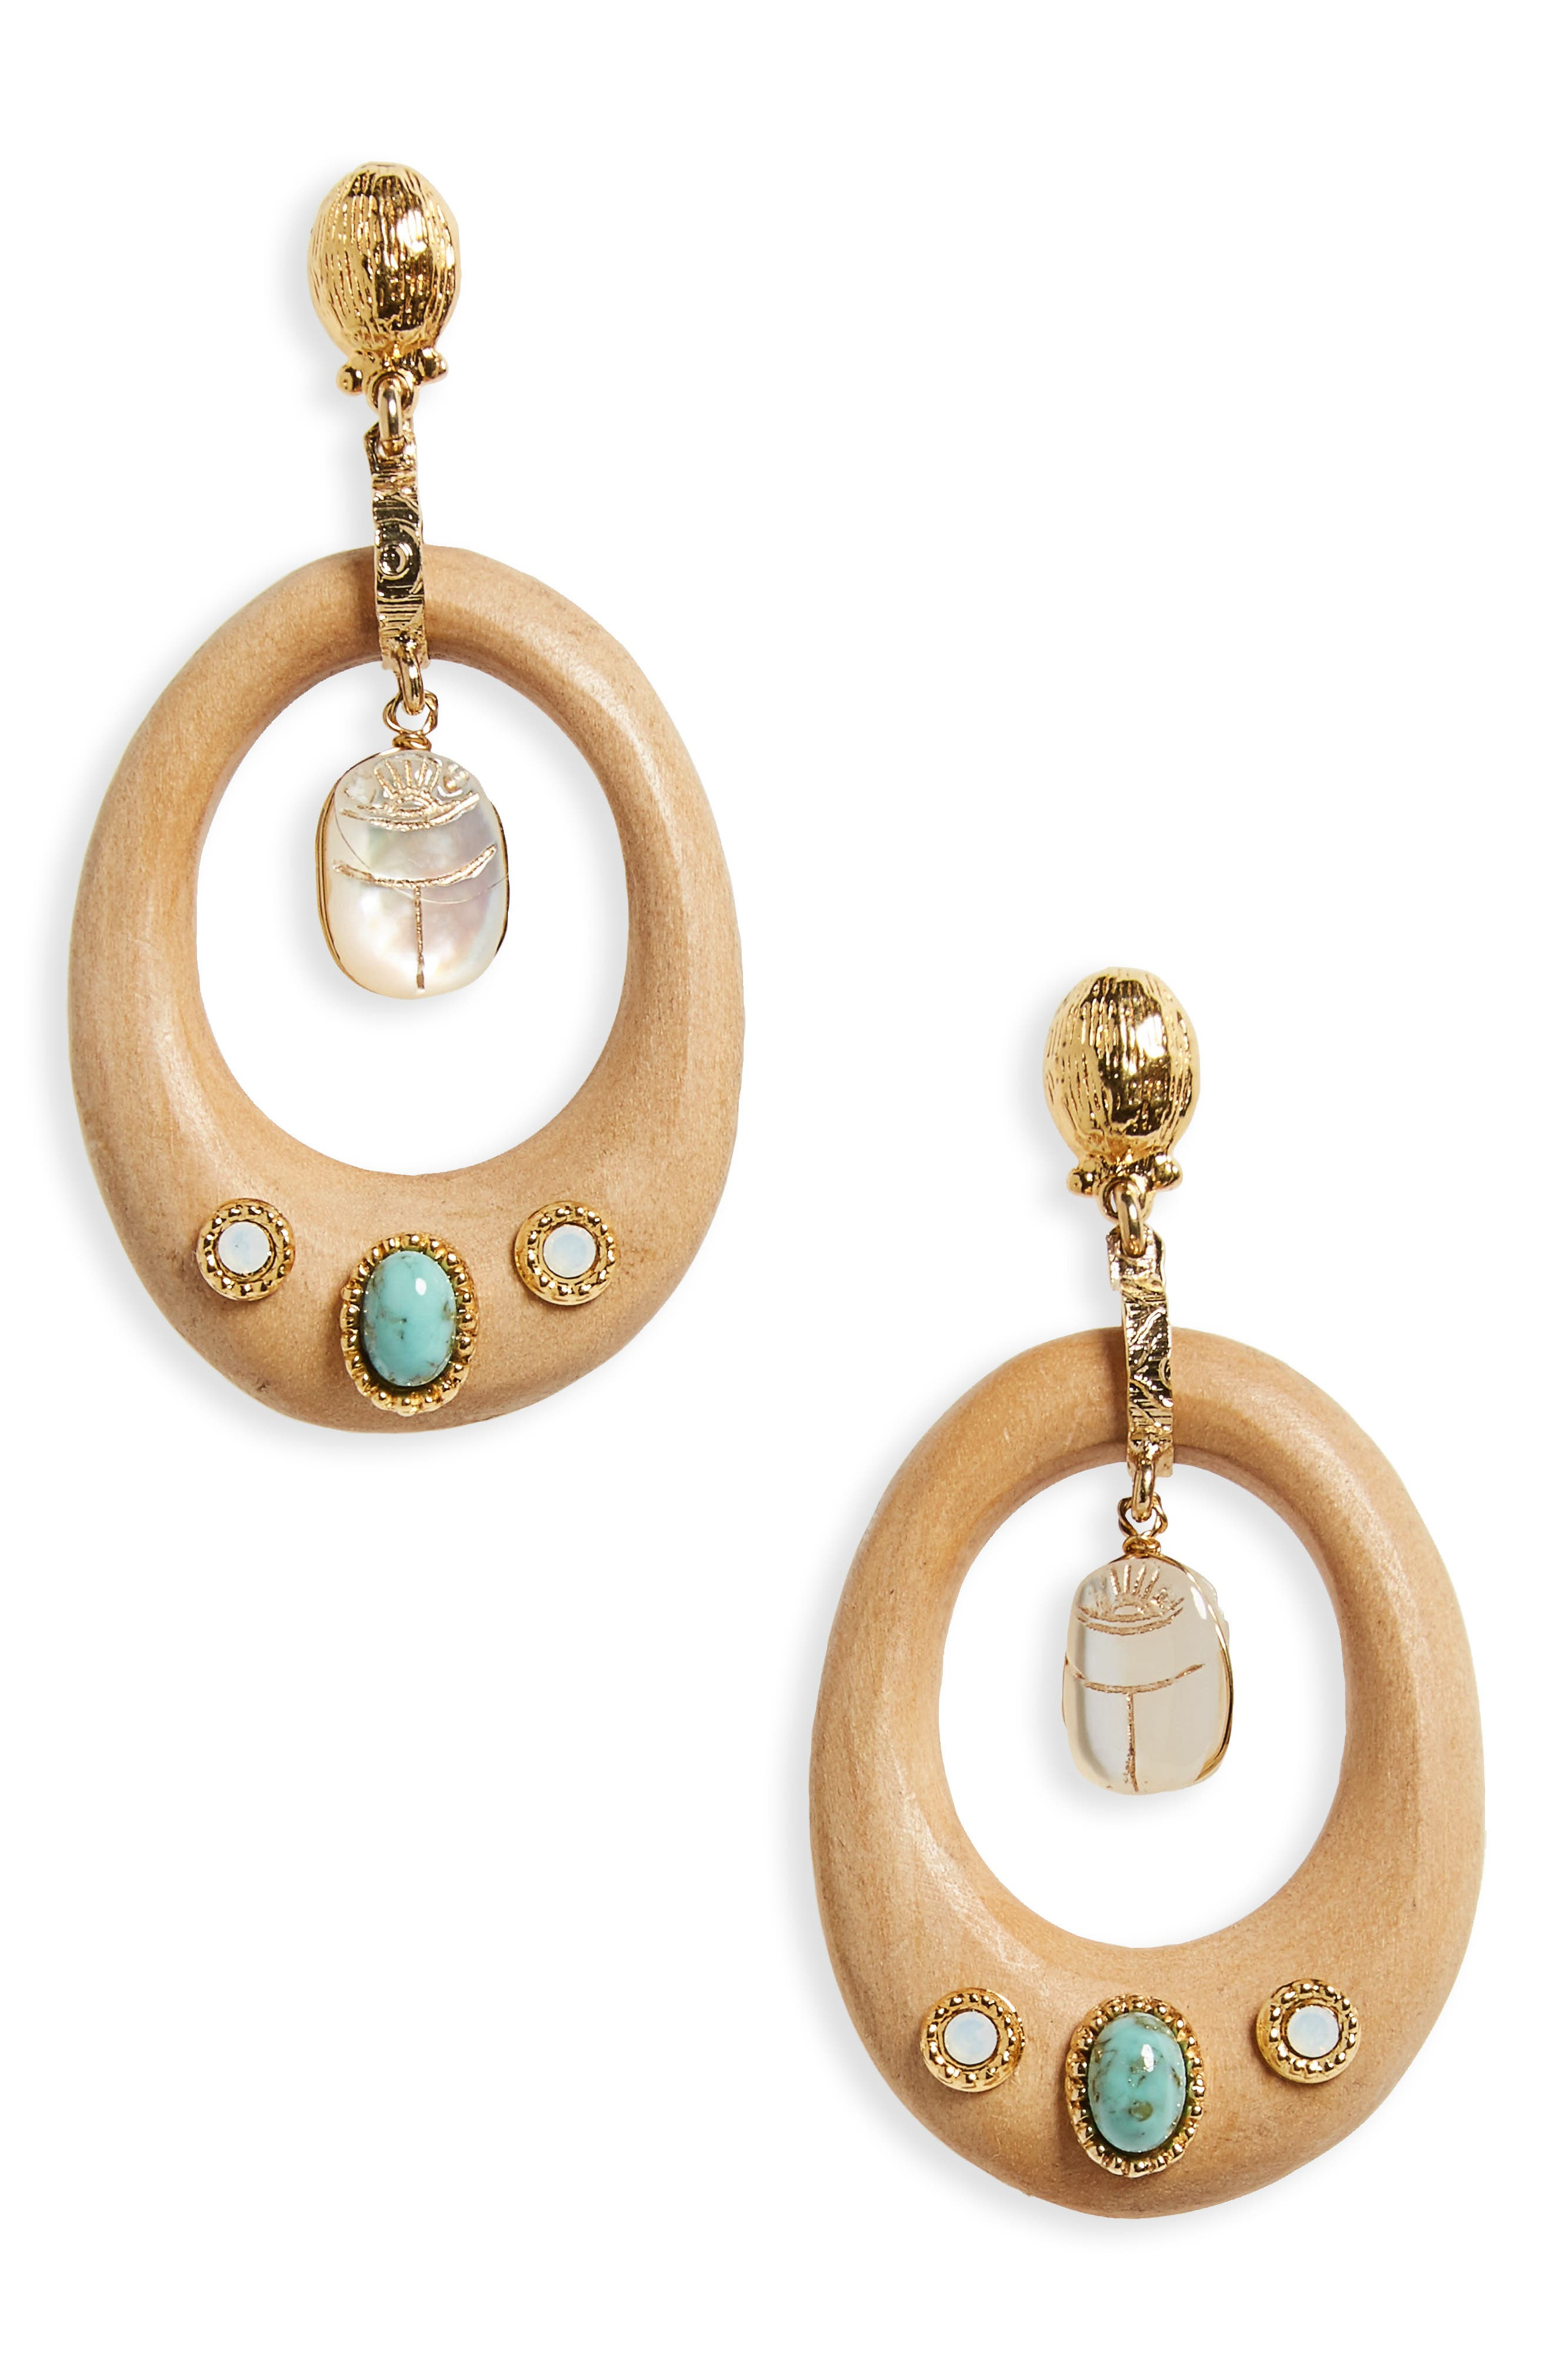 Woodstock Drop Earrings,                         Main,                         color, Brown/ Turquoise